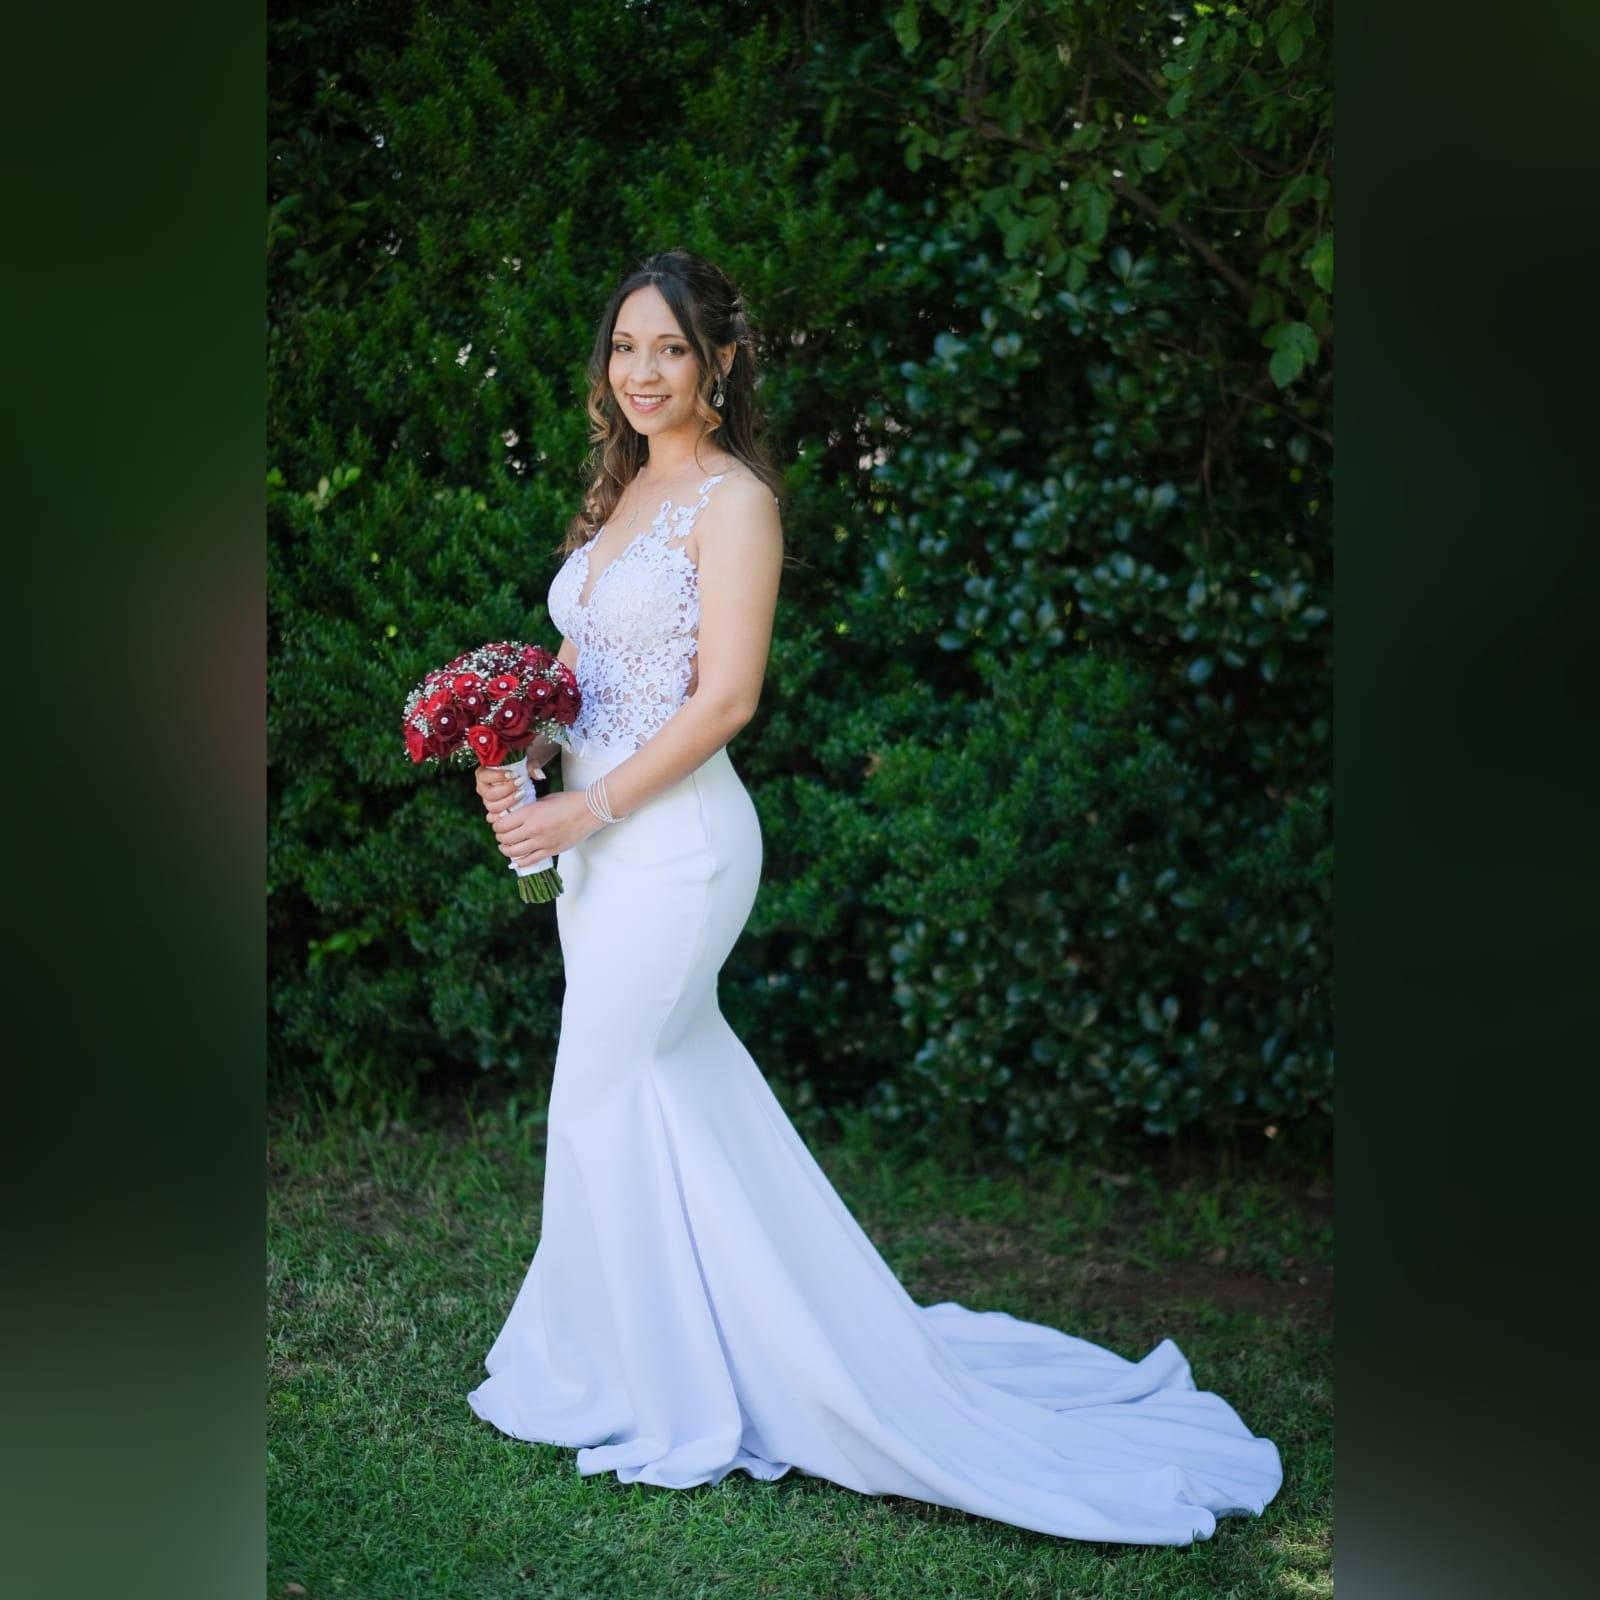 Wedding dresses info 17